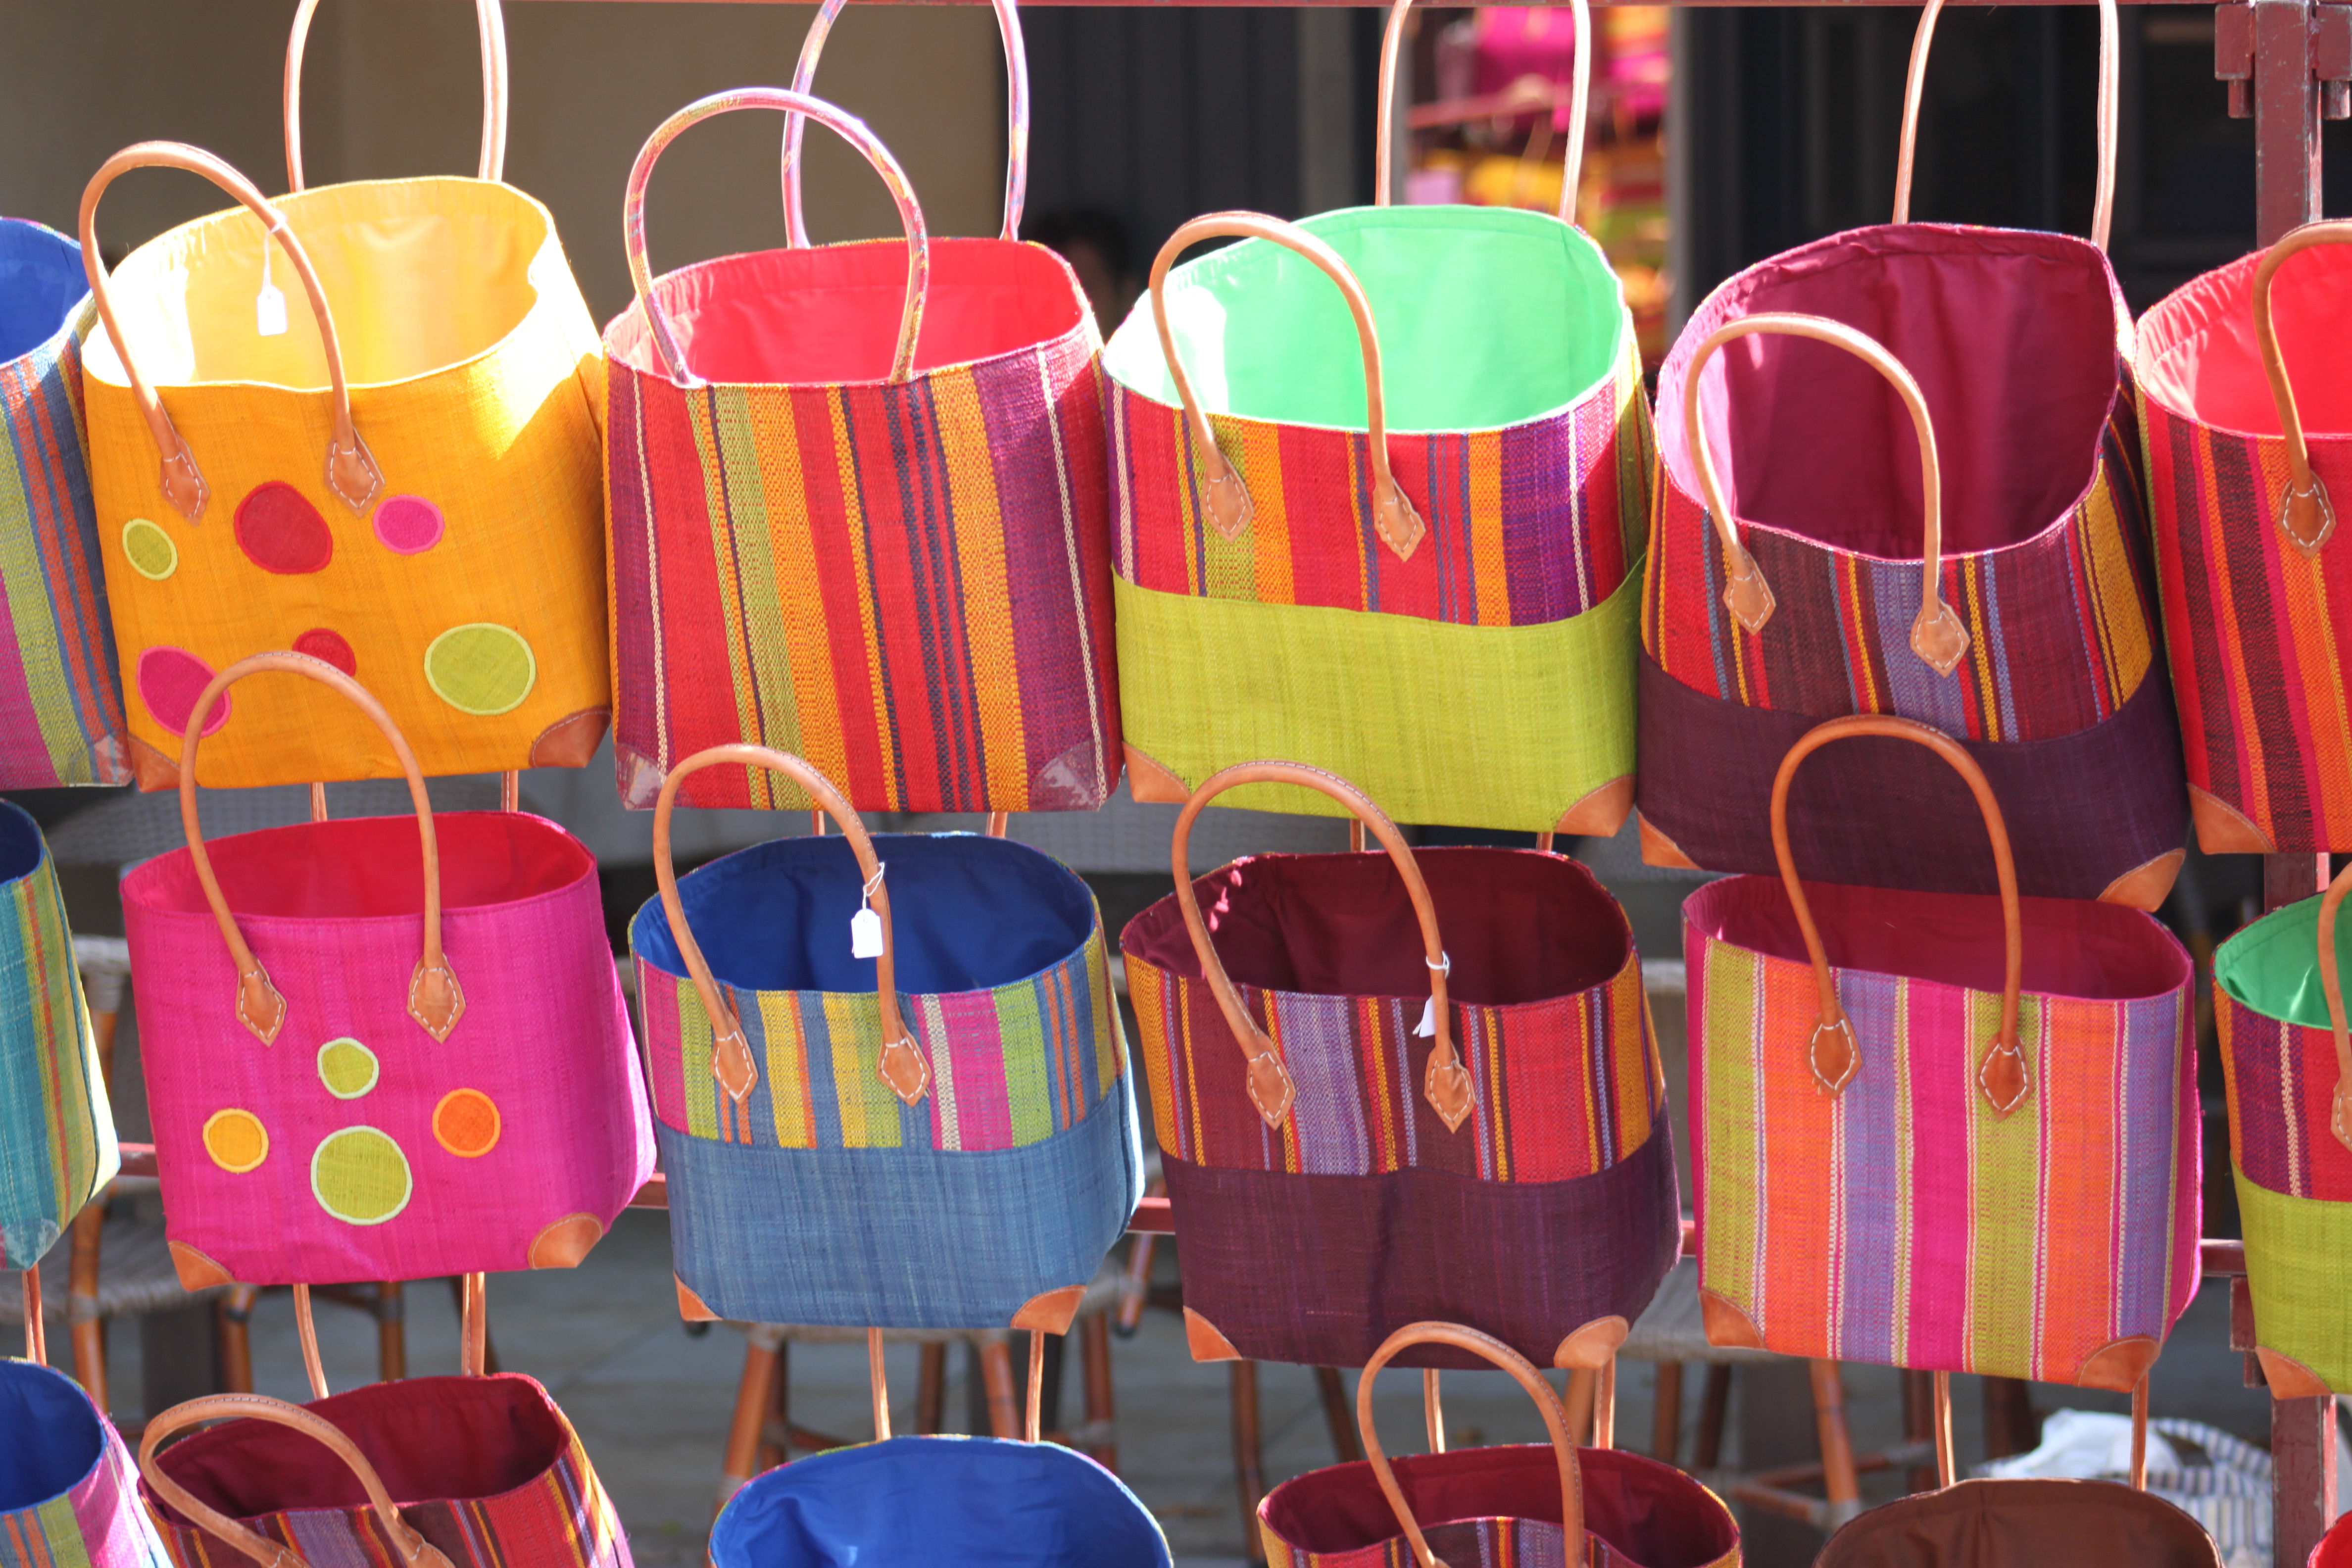 Provence market bags #Provence #Markets @GingerandNutmeg